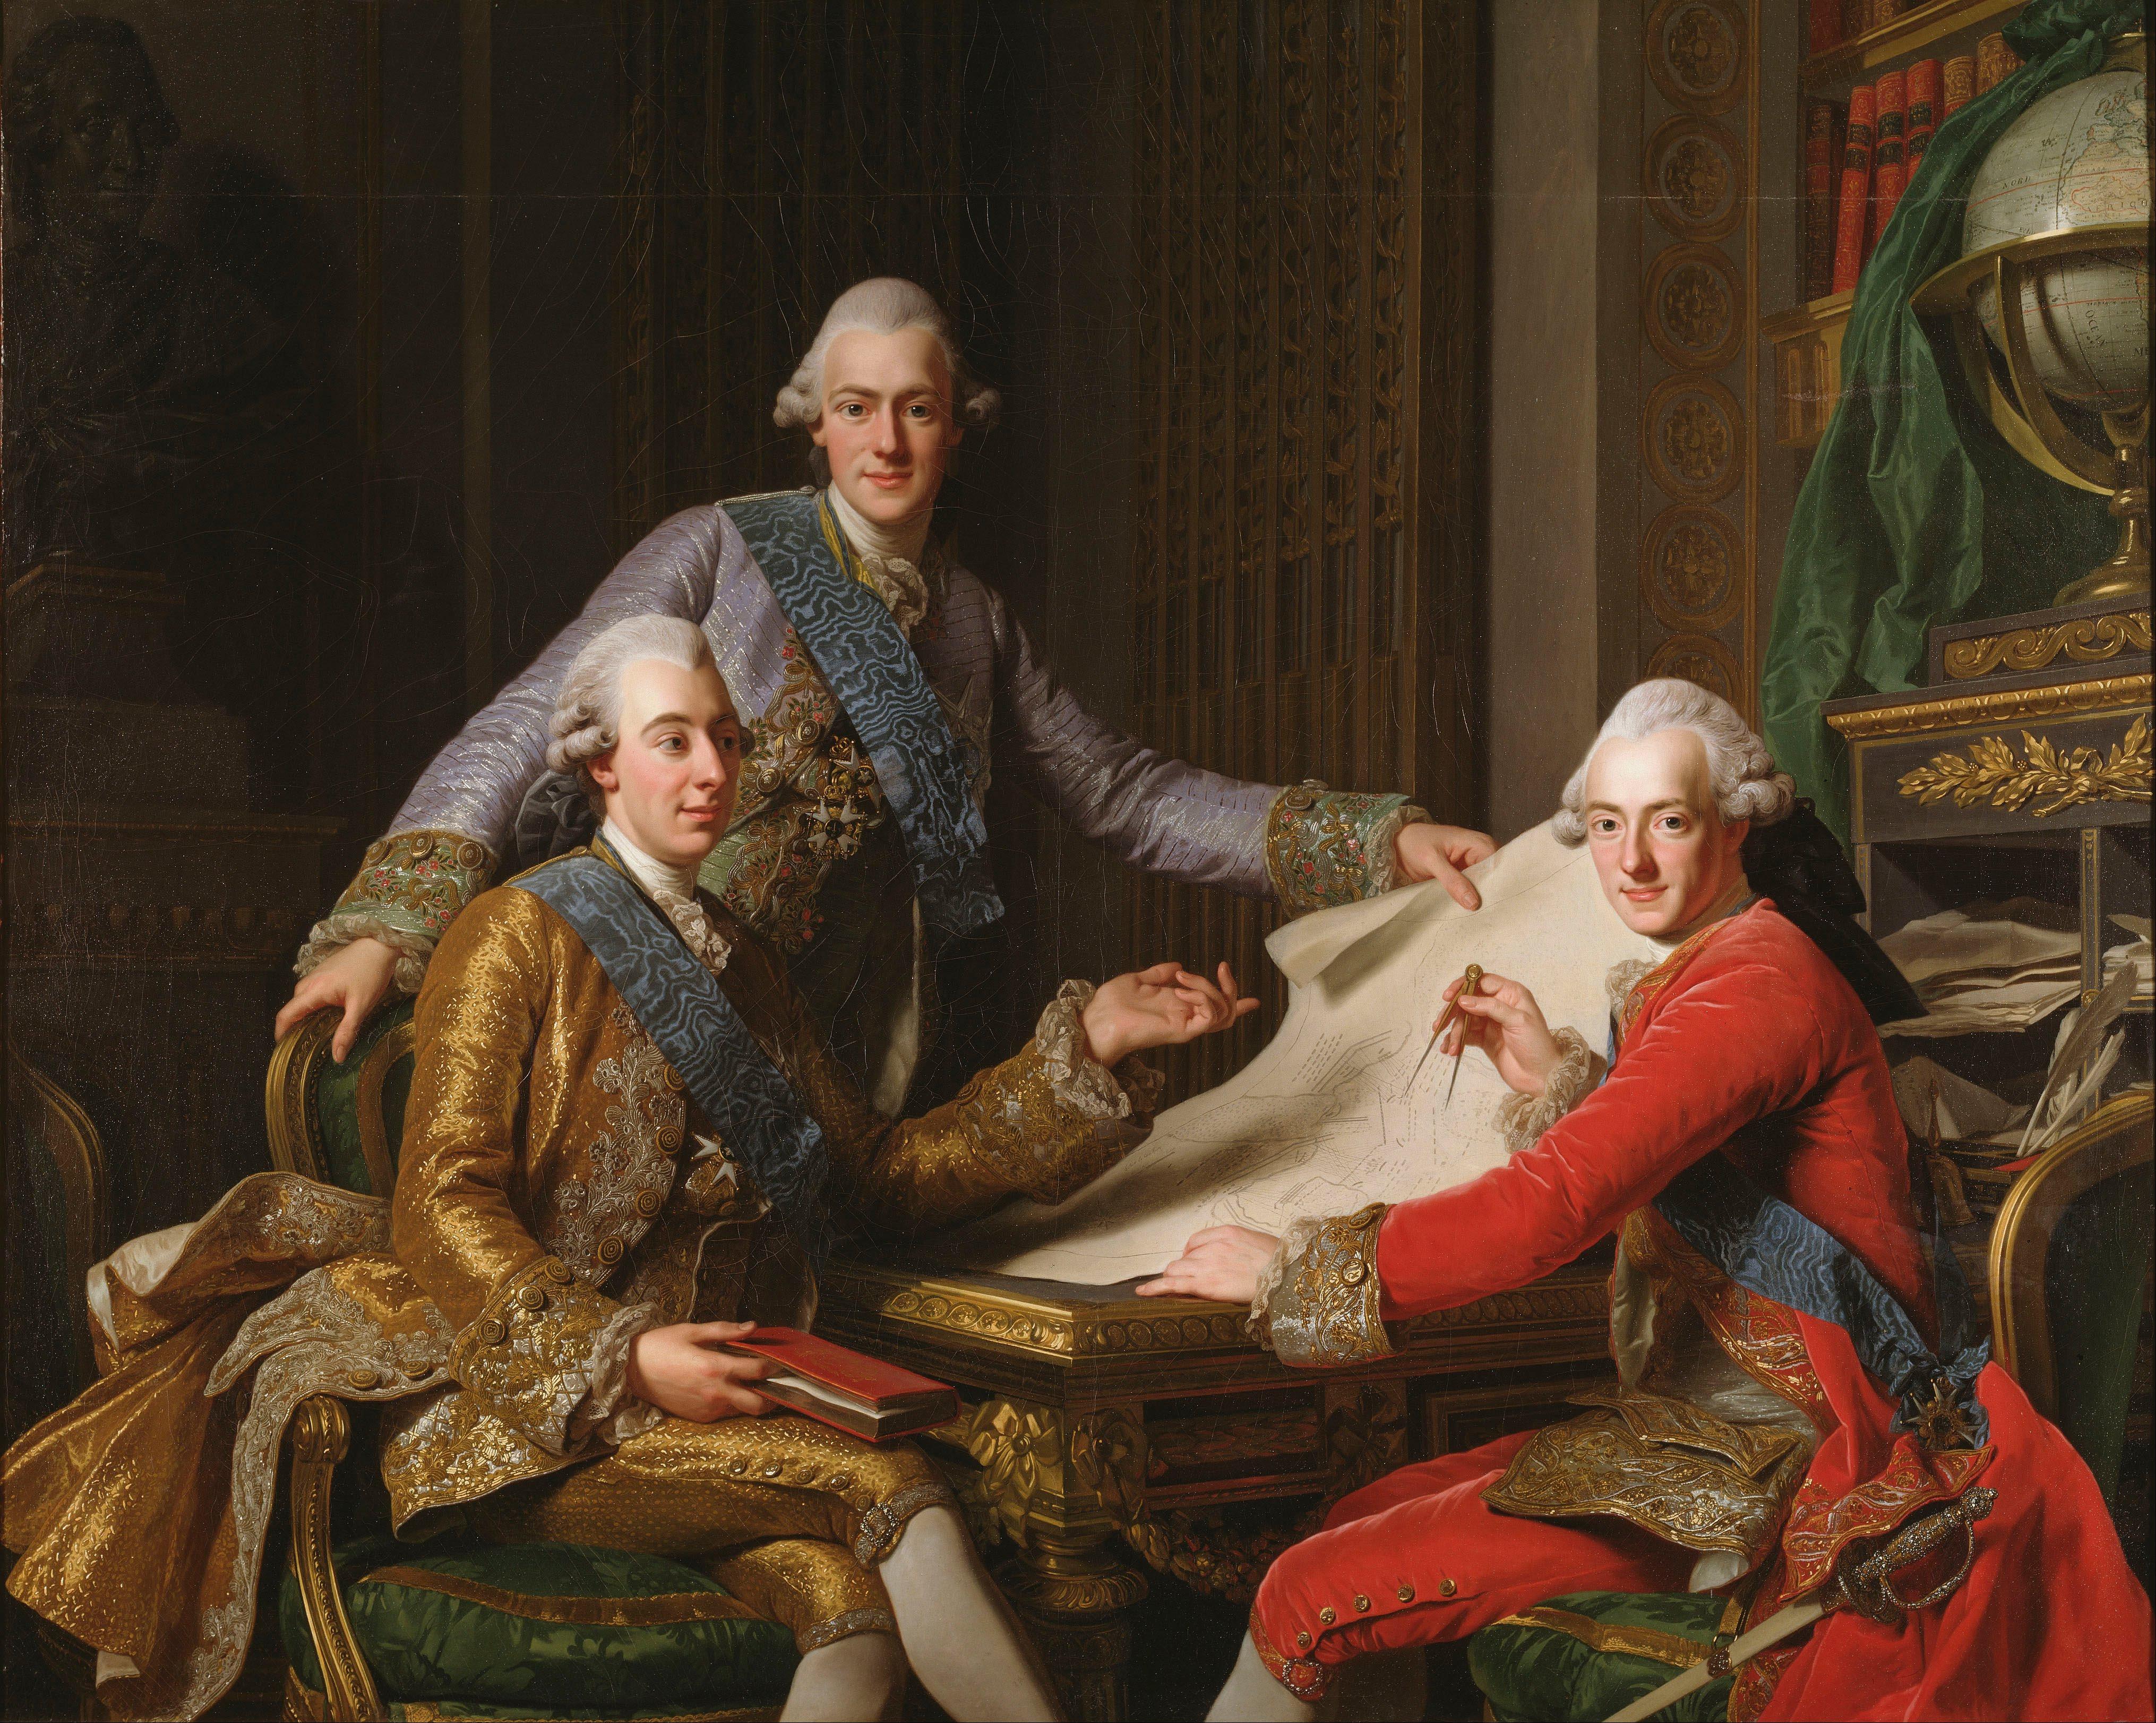 Alexander_Roslin_-_King_Gustav_III_of_Sweden_and_his_Brothers_-_Google_Art_Project